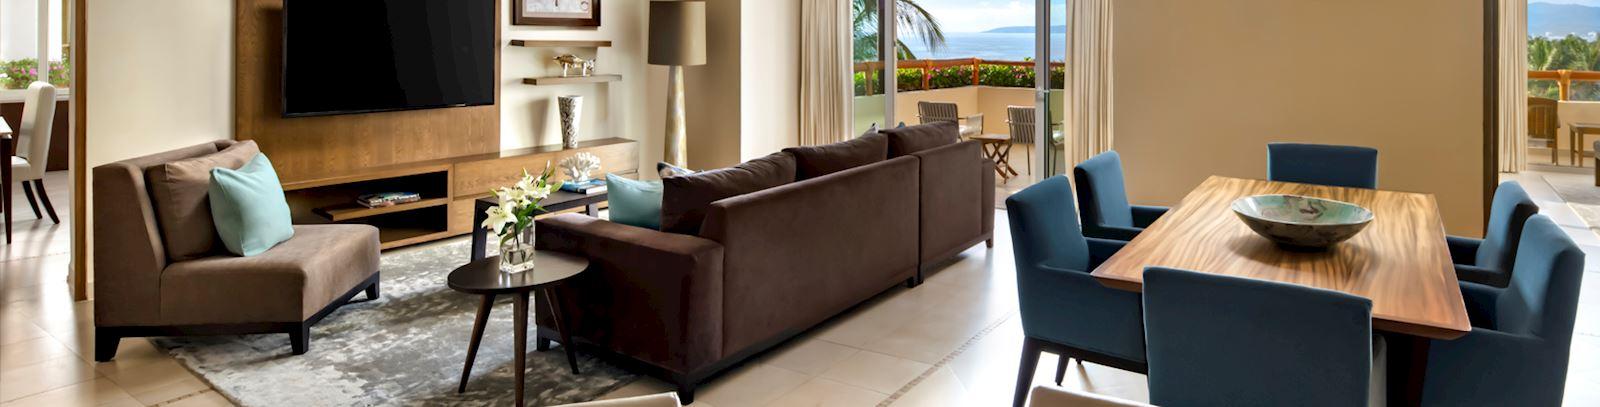 Two-Bedroom Family Suite in Grand Velas Riviera Nayarit